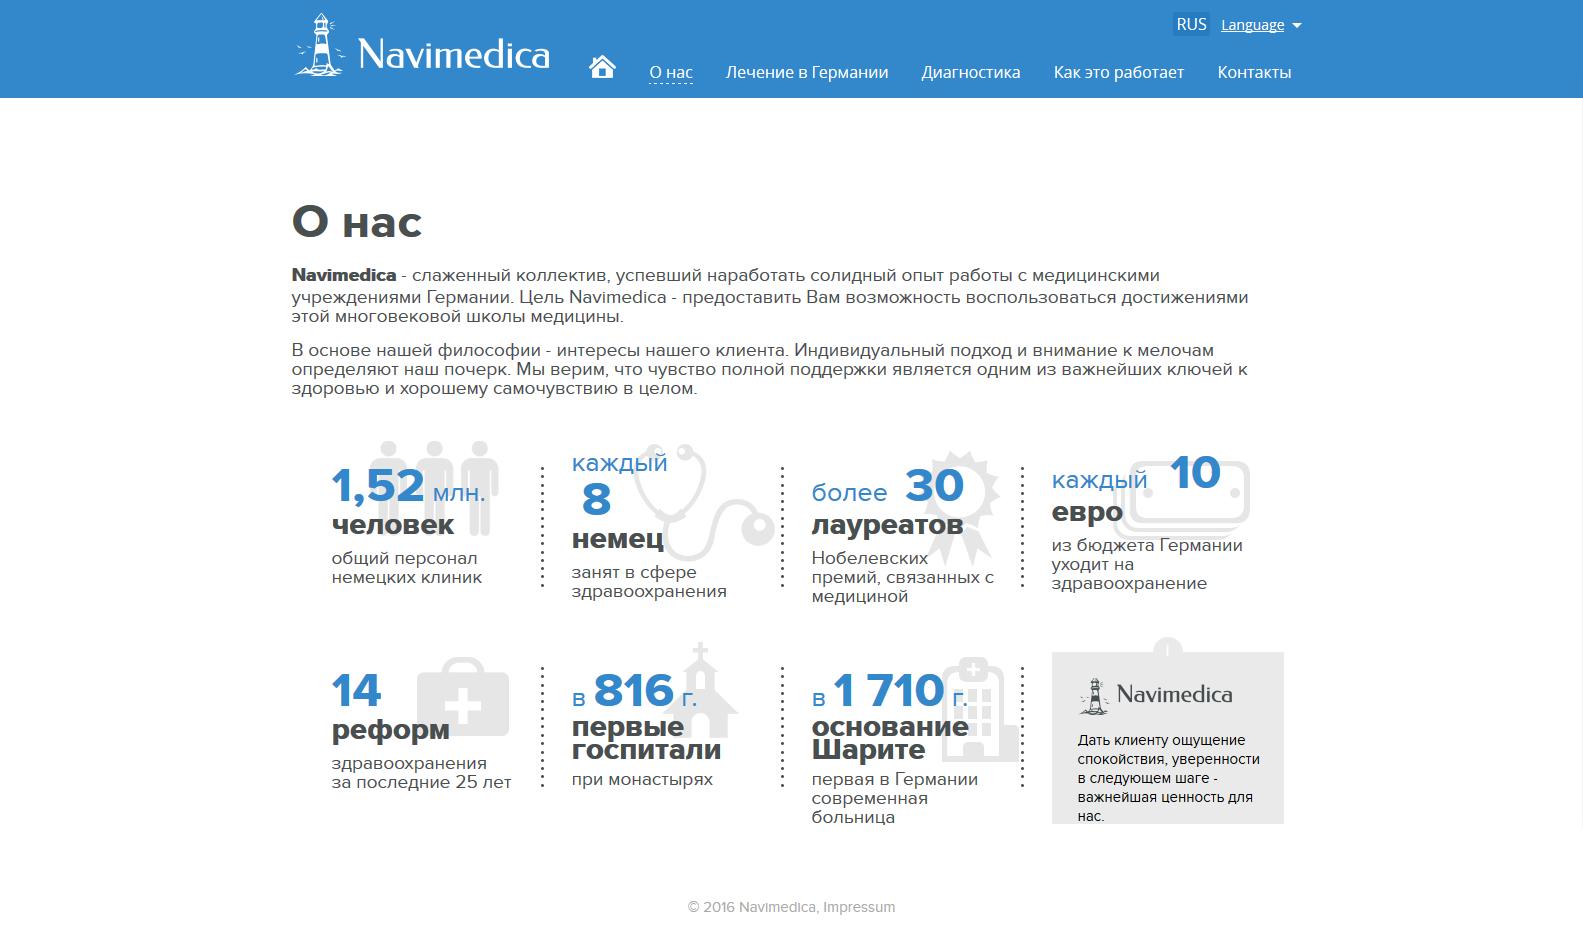 Navimedica - Лечение в Германии